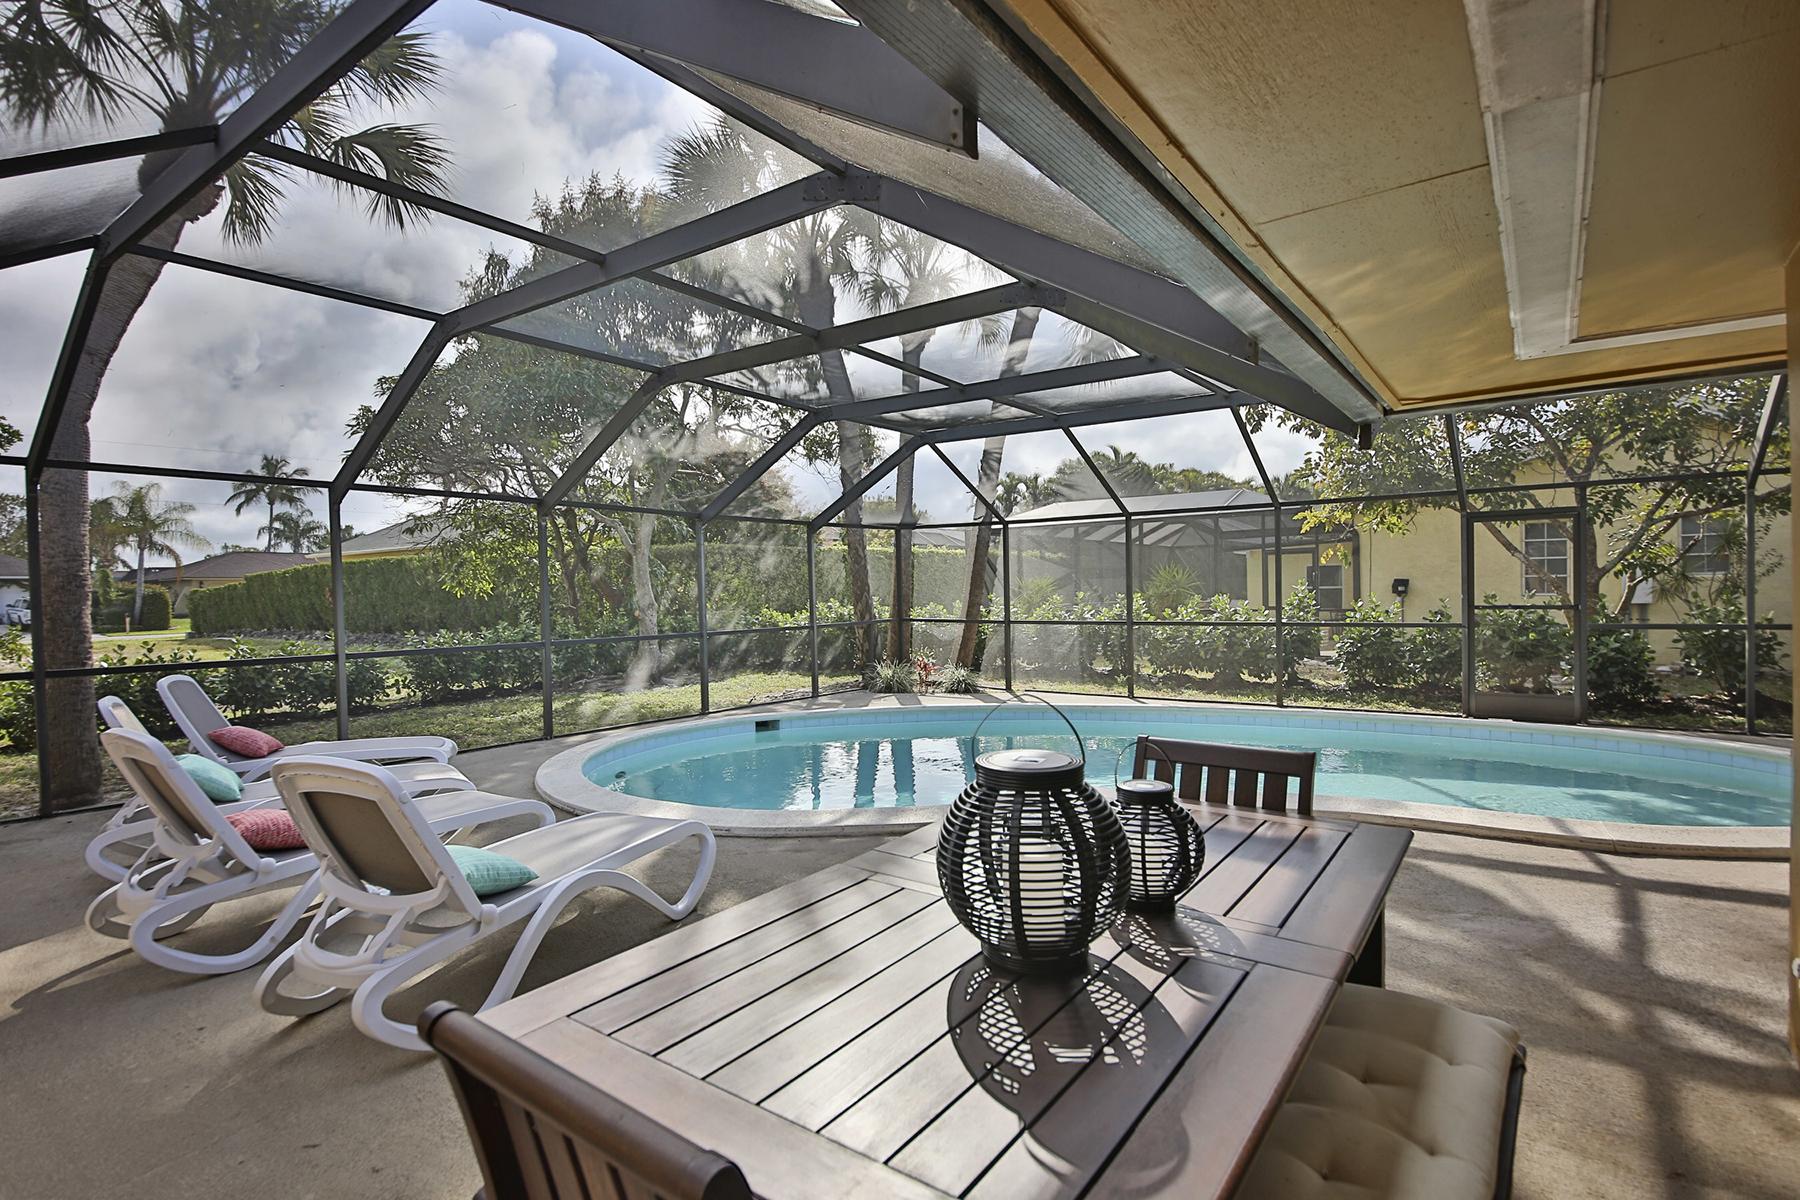 Maison unifamiliale pour l Vente à MARCO ISLAND - TAHITI ROAD 155 Tahiti Rd Marco Island, Florida, 34145 États-Unis